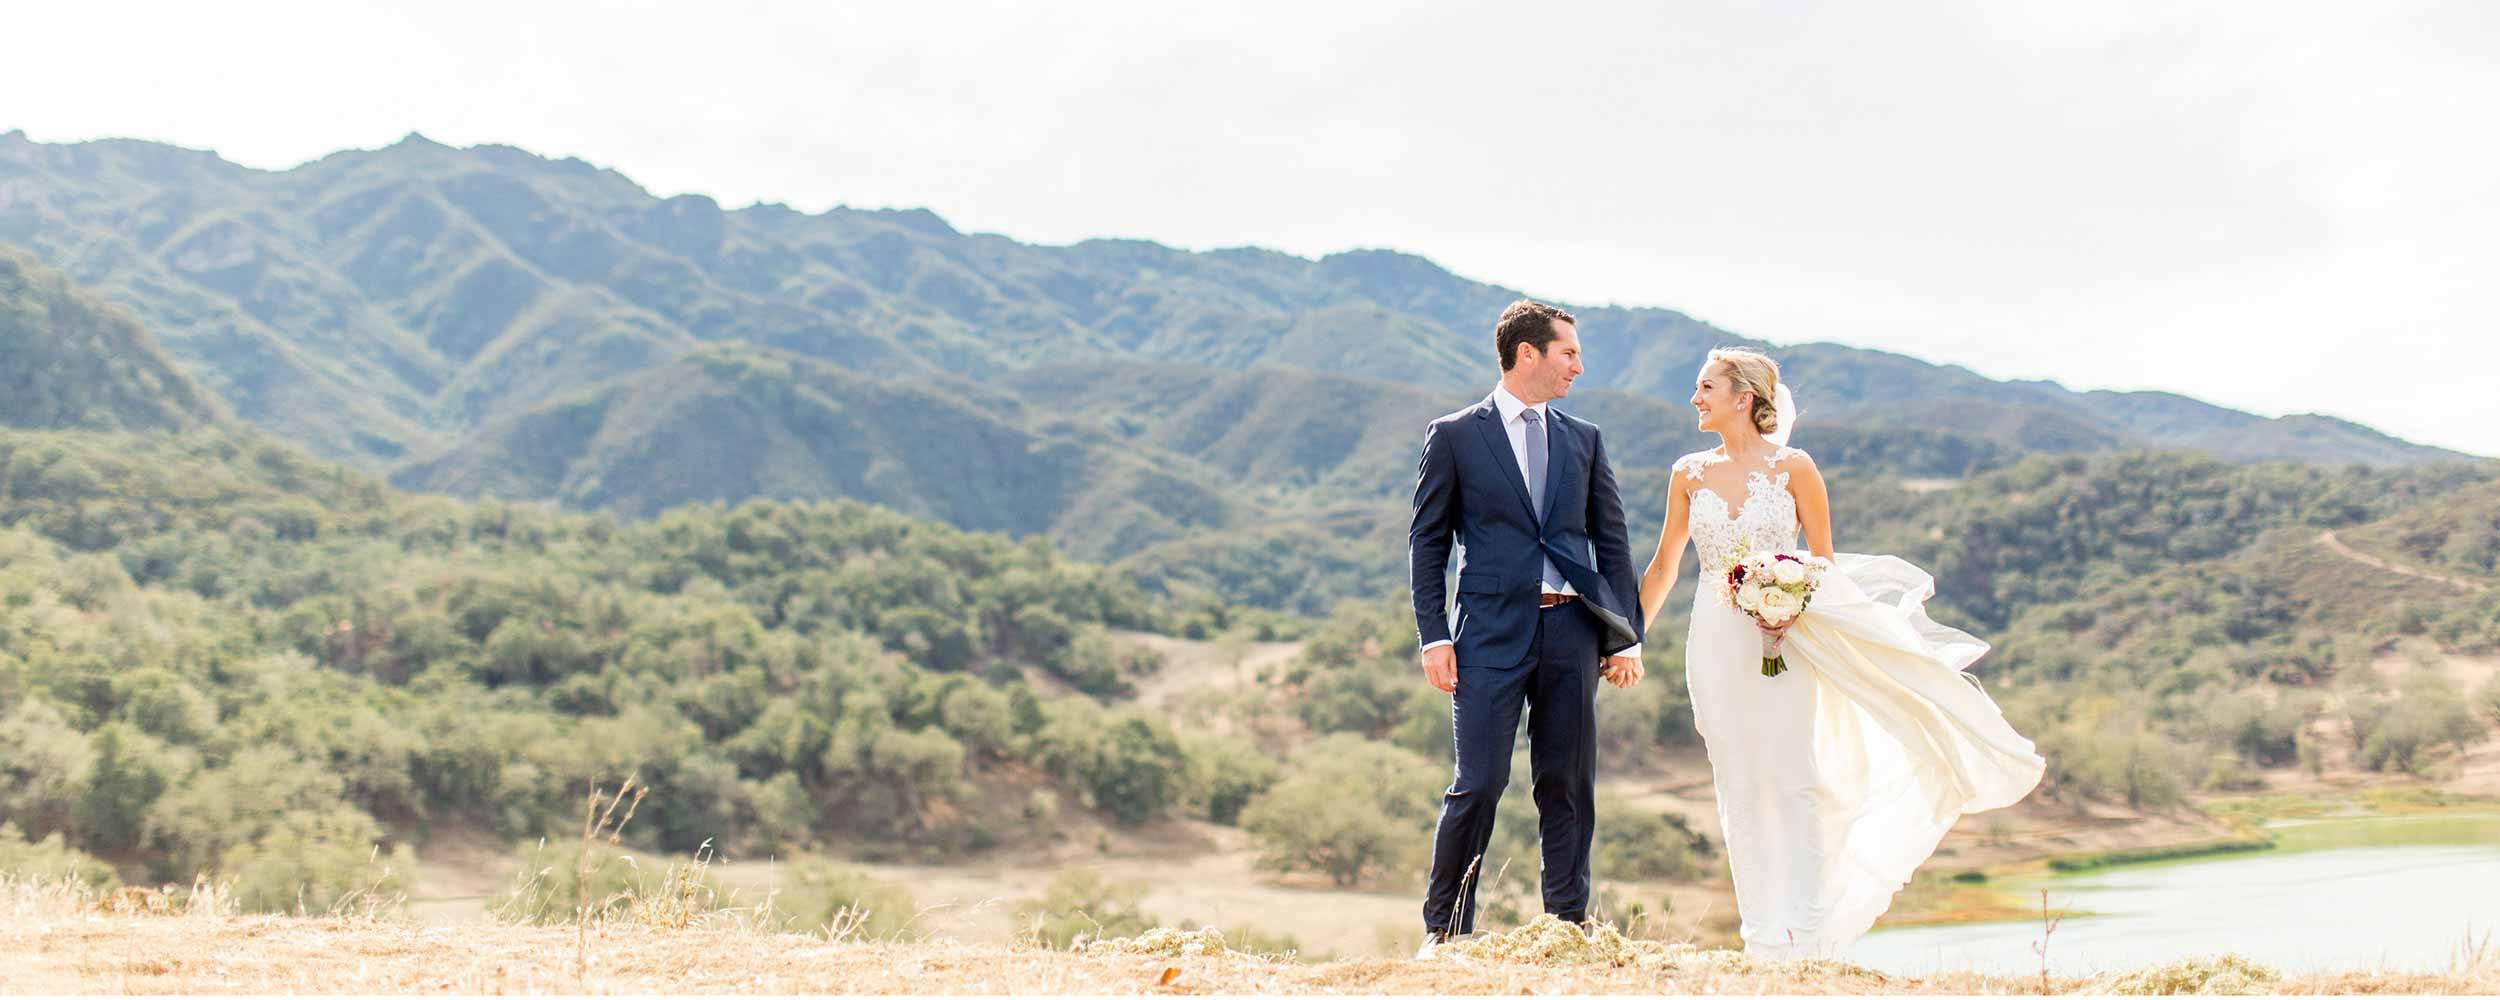 Alisal weddings - Alisal Resort in Solvang California